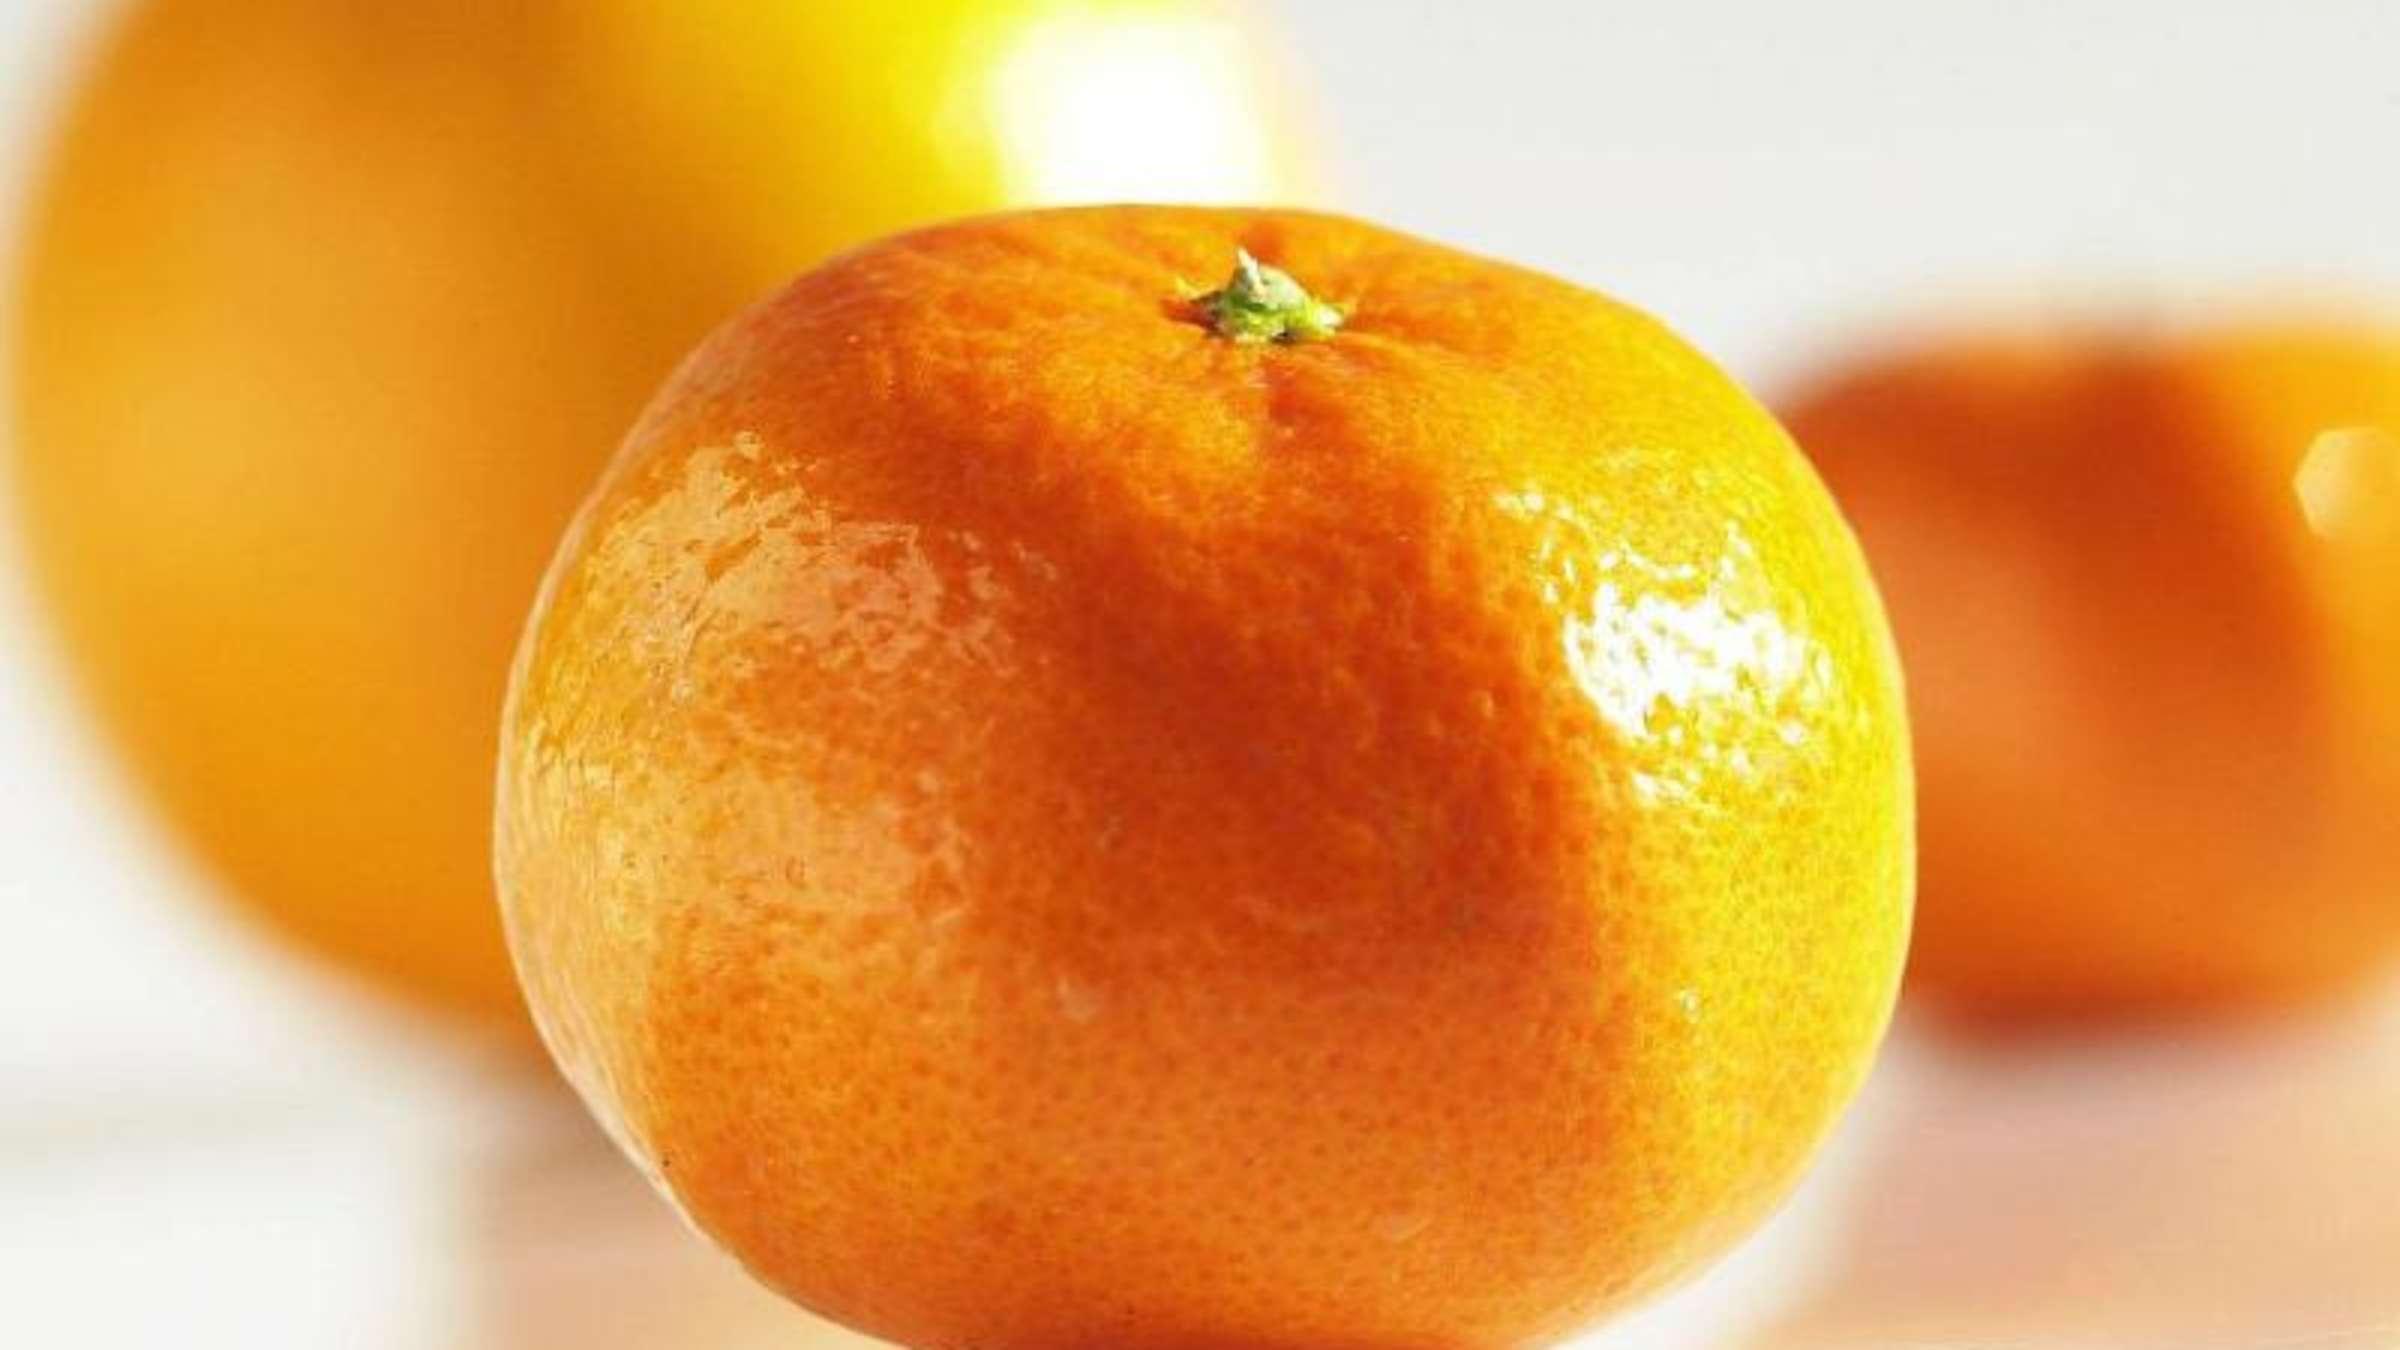 clementine kerne